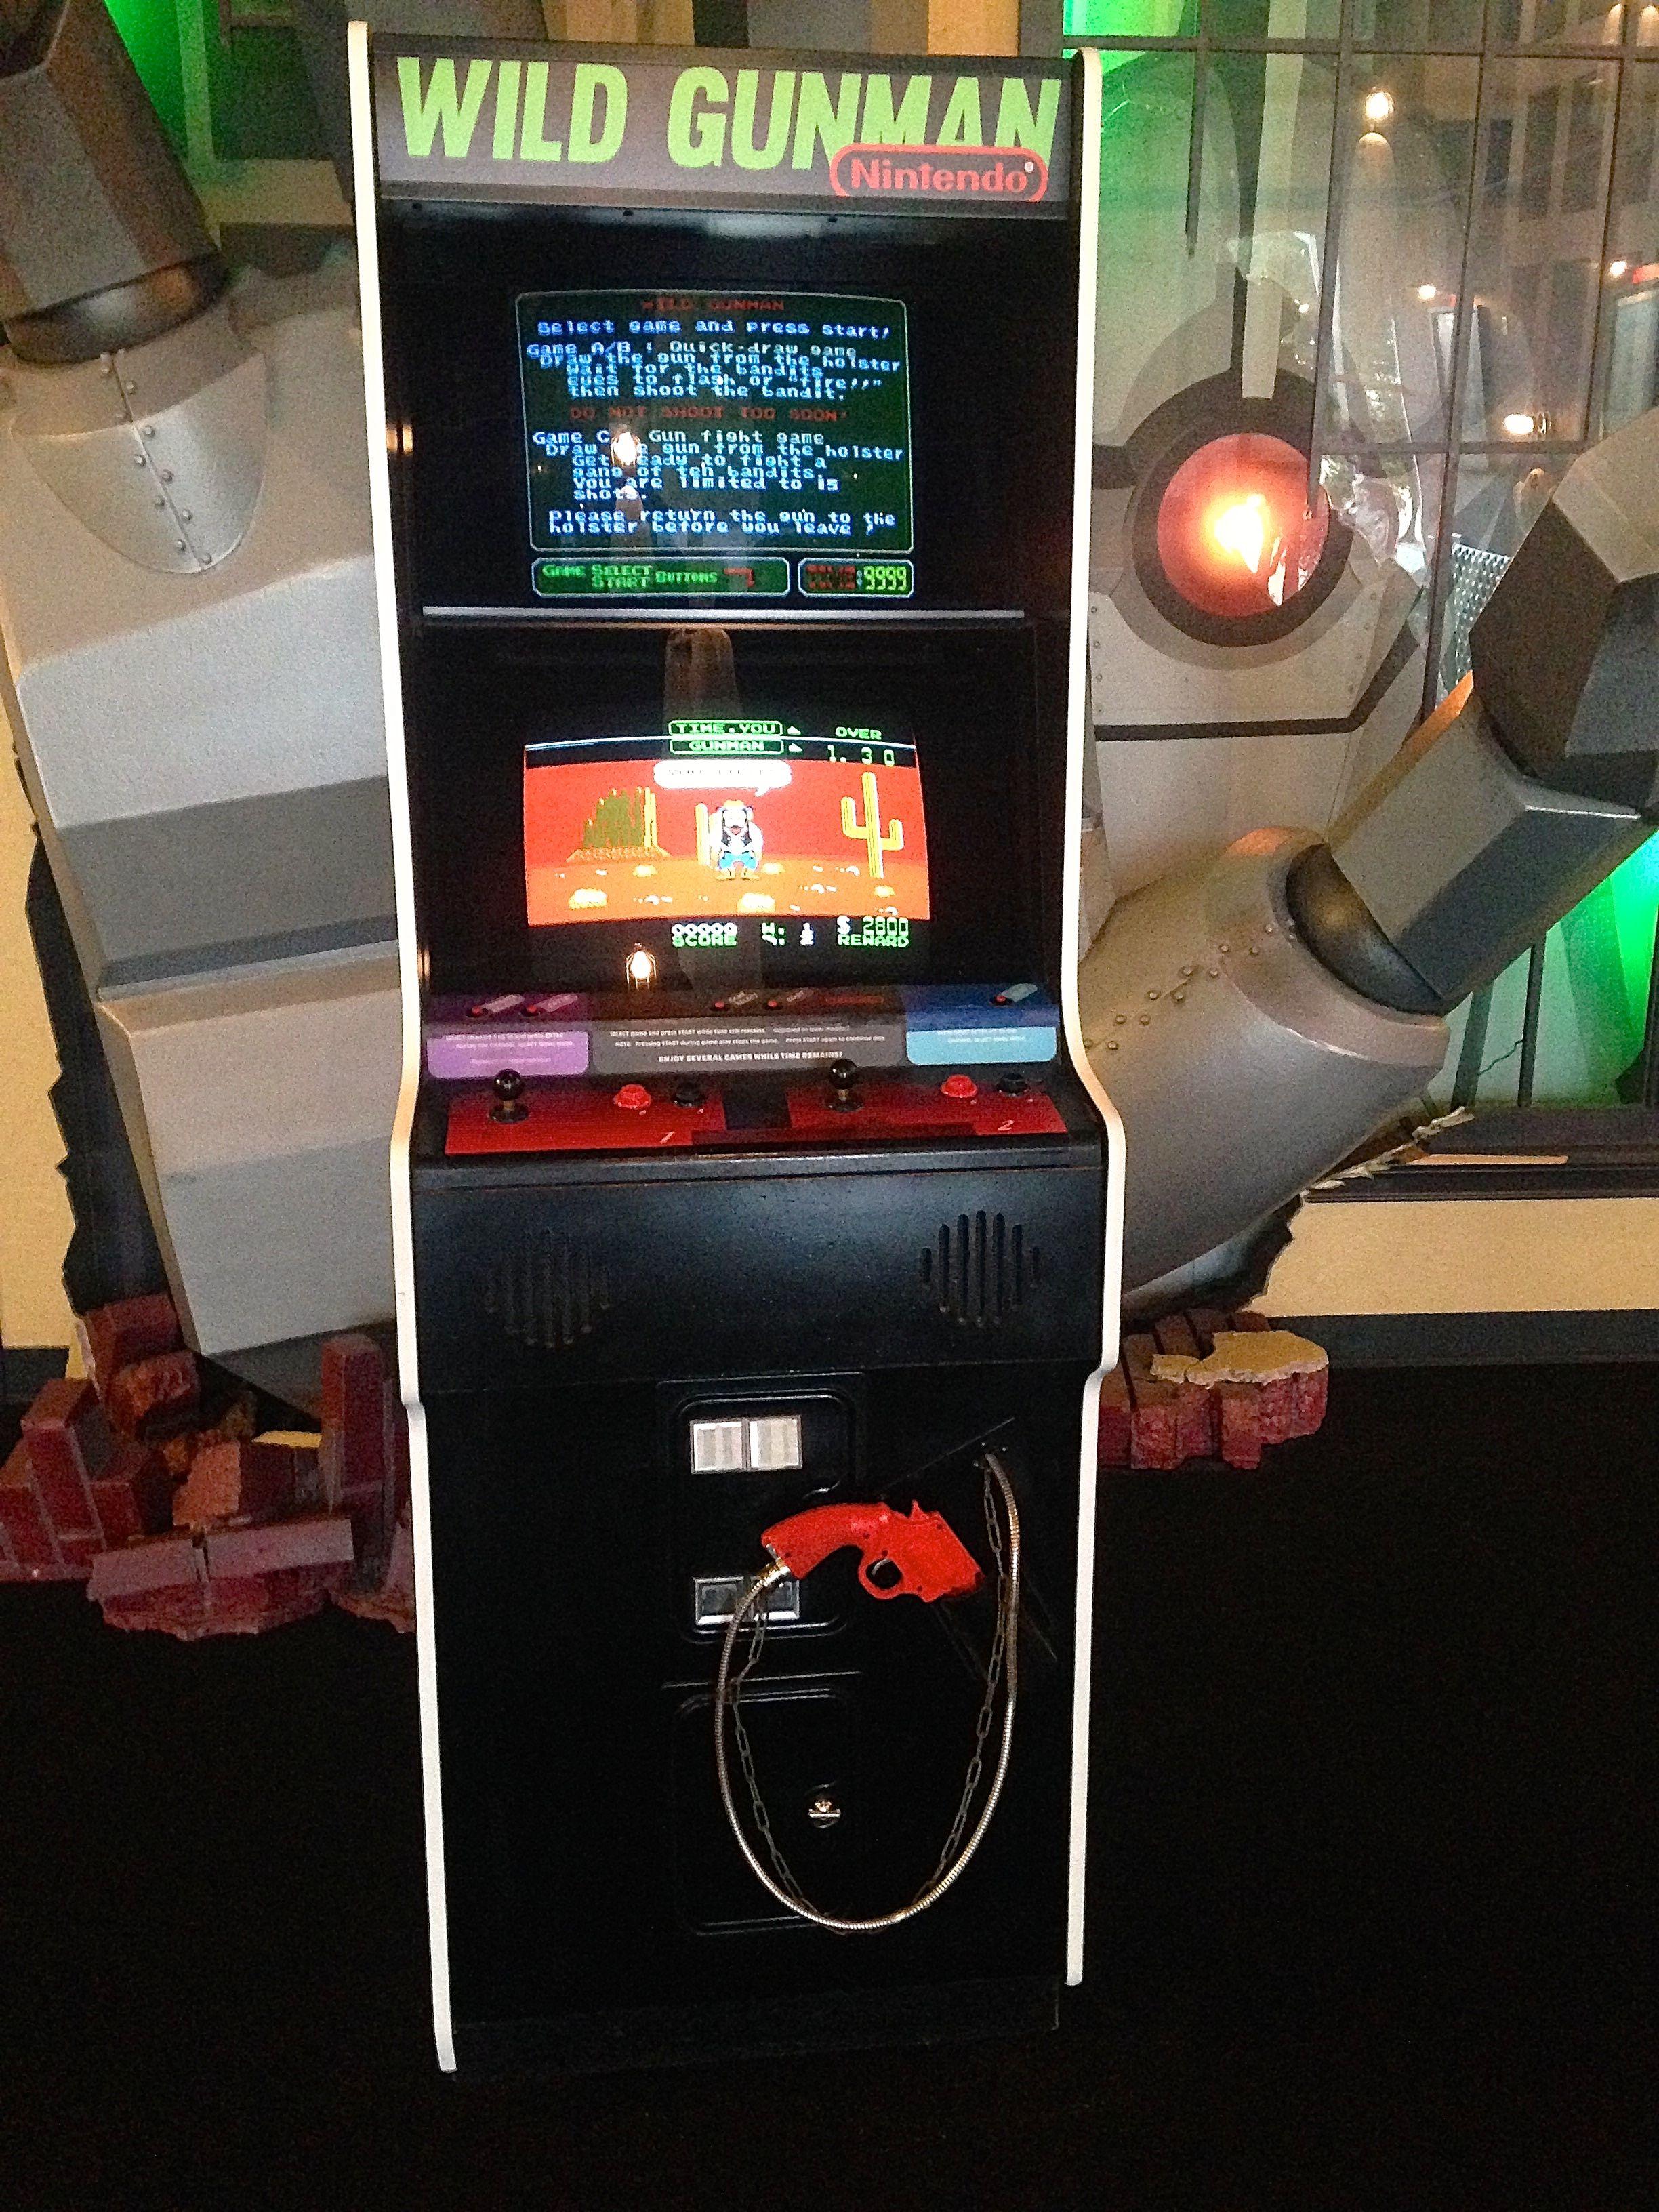 Ninja Turtles Arcade Cabinet Police Trainer Arcade Cabinet Google Search Light Gun Arcade